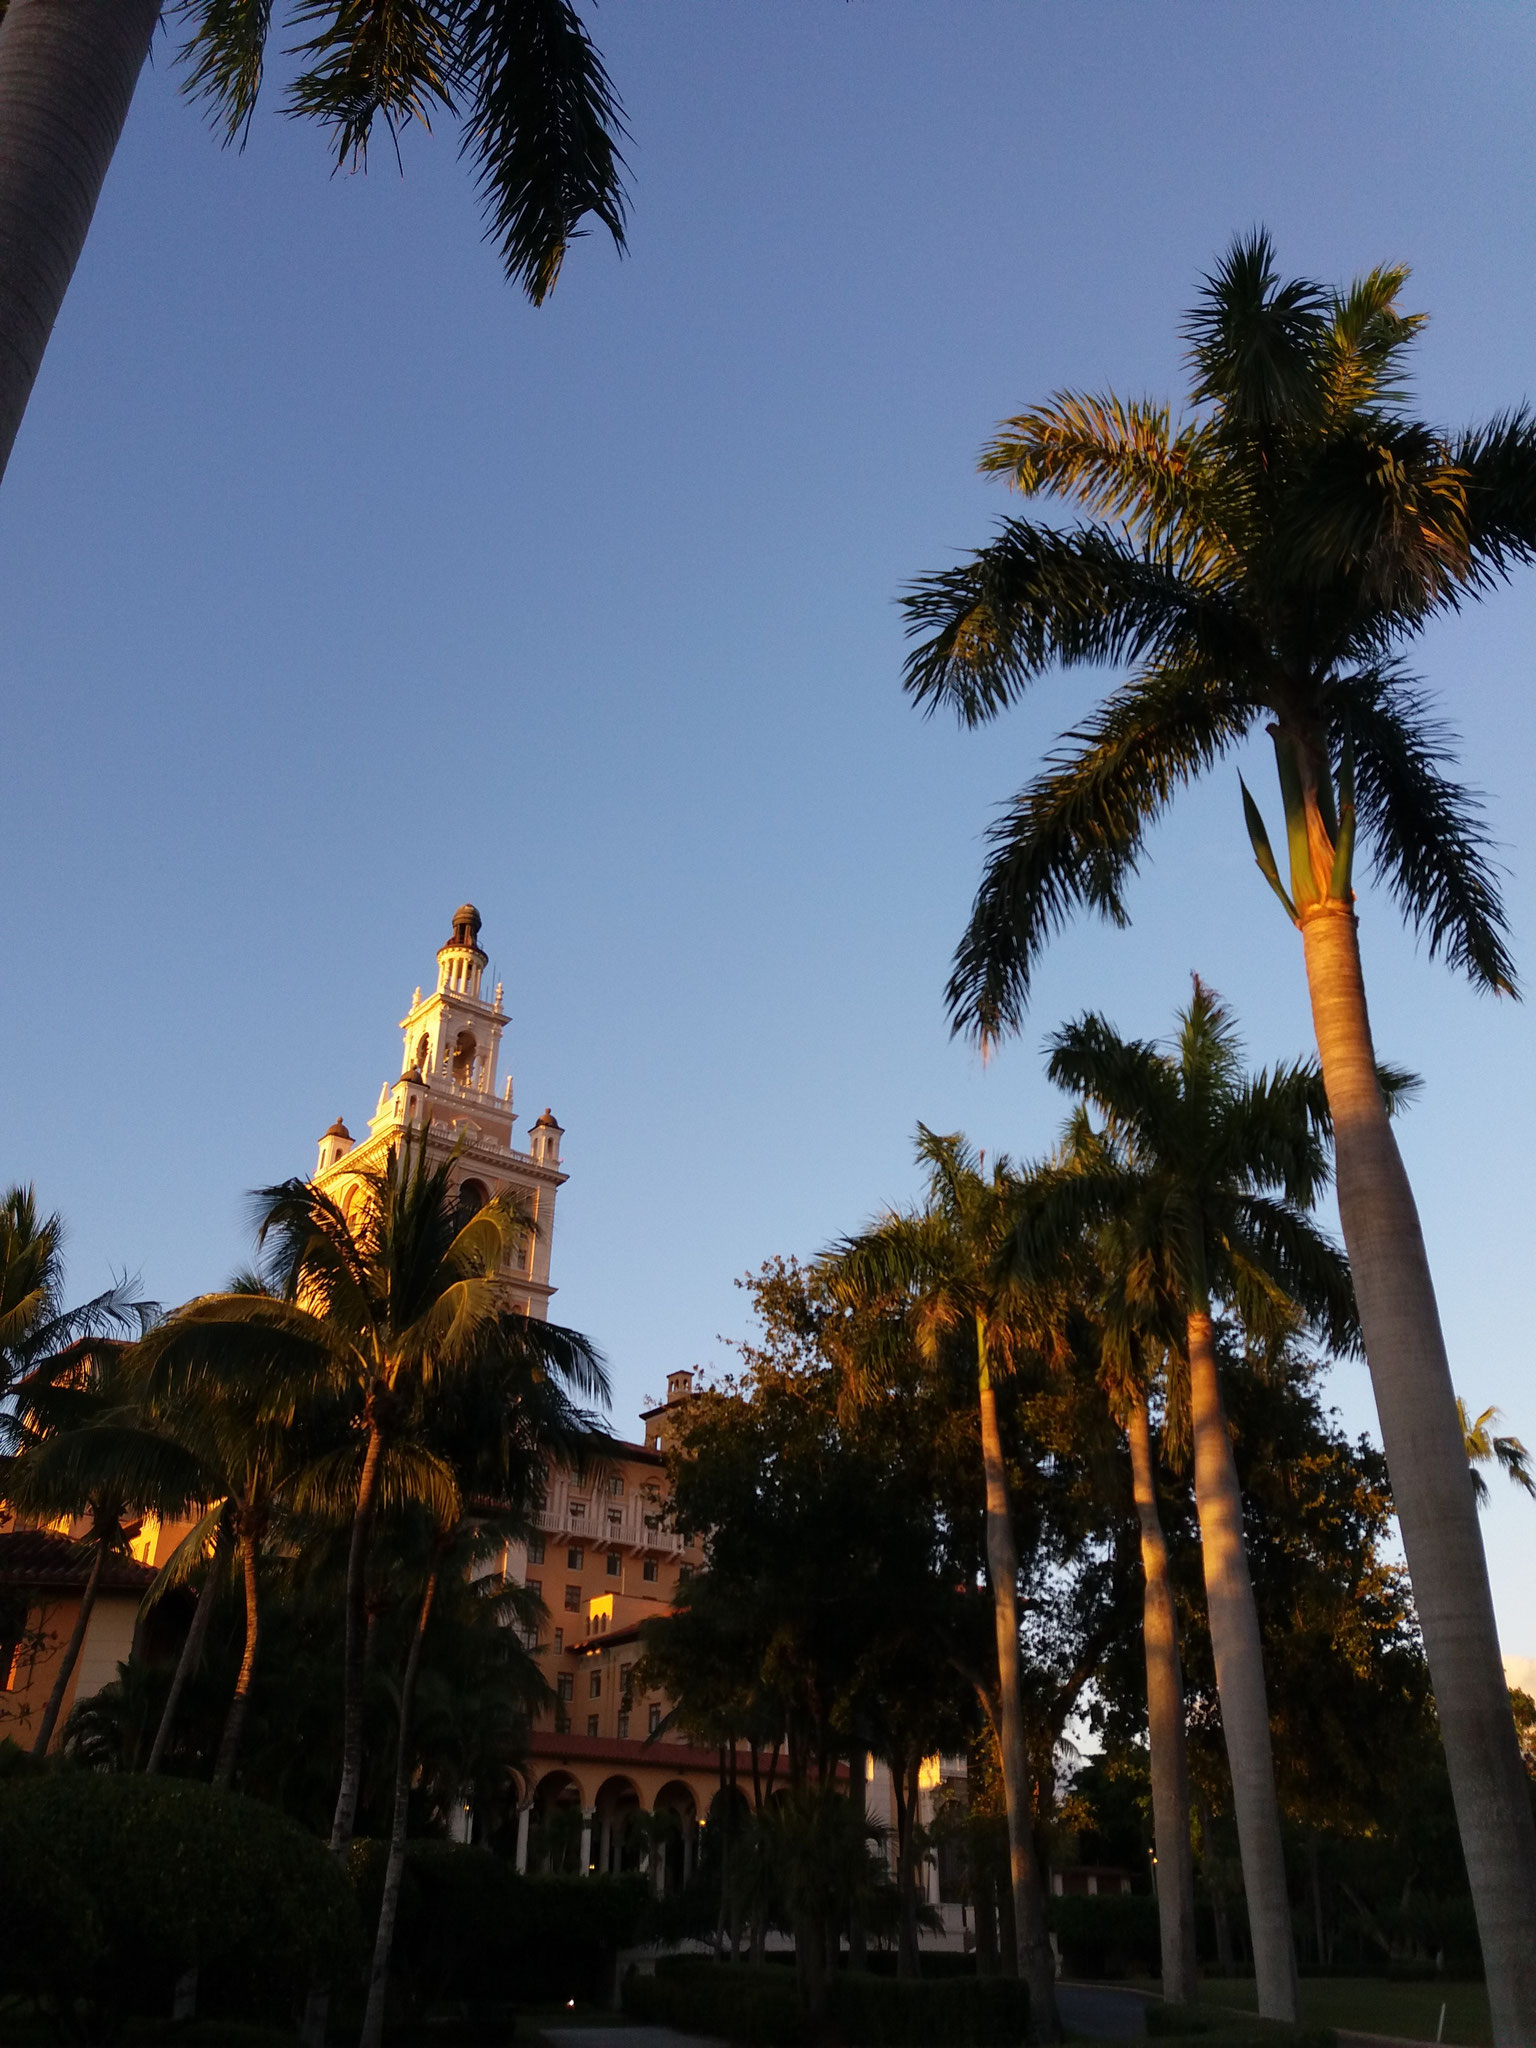 Biltmore Hotel Coral Gables, Miami (Floride)